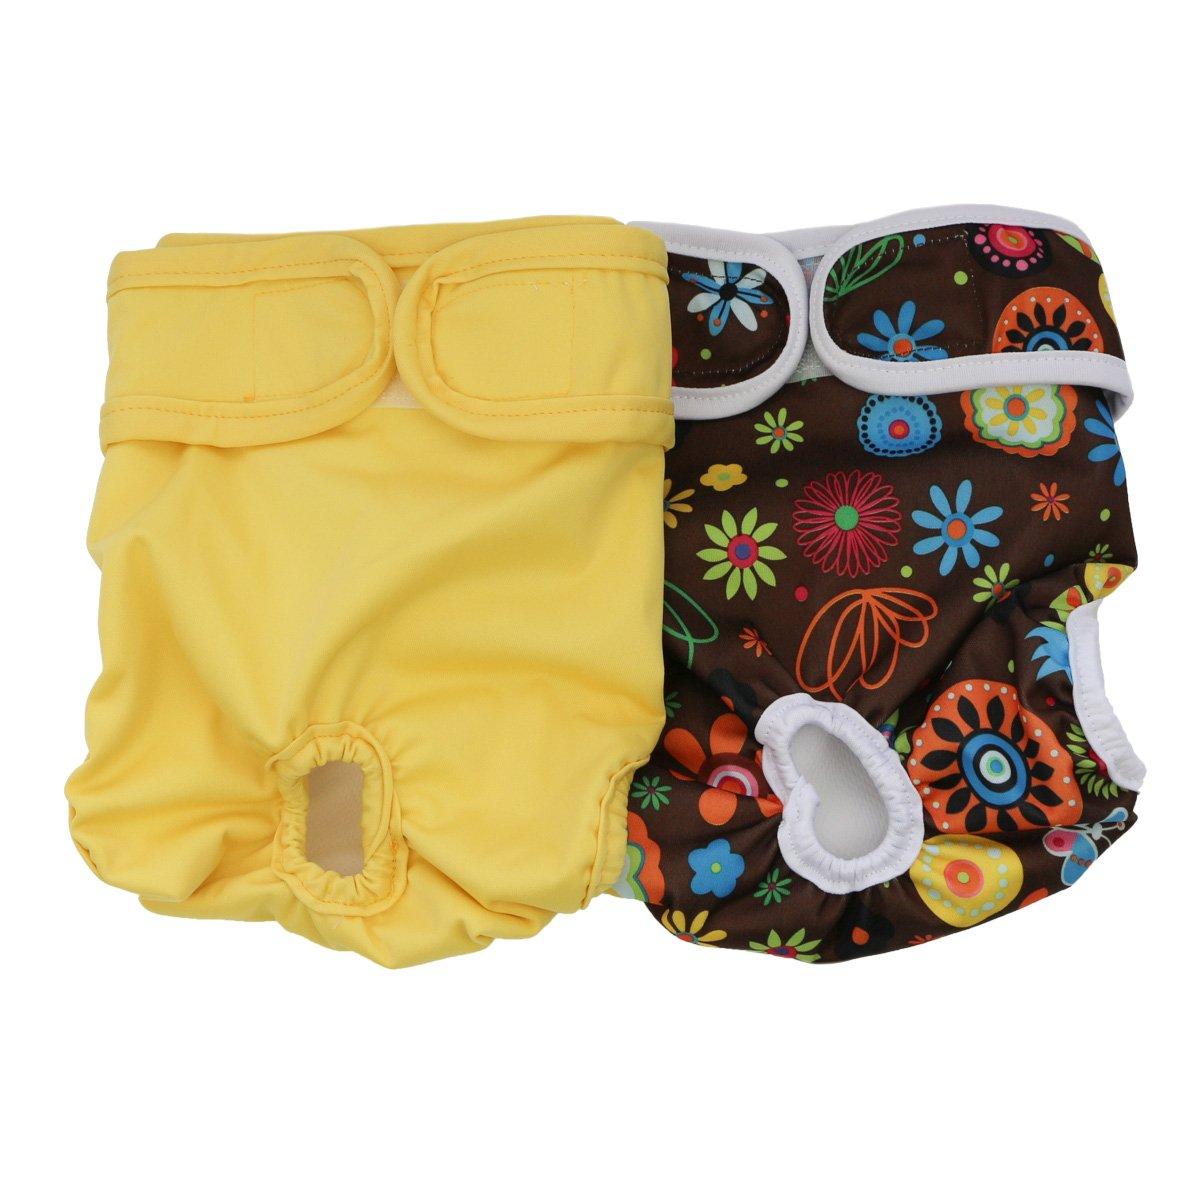 Hisprout Female Dog Diaper Reusable Washable Durable Doggie Diapers Pants(DDFL04)